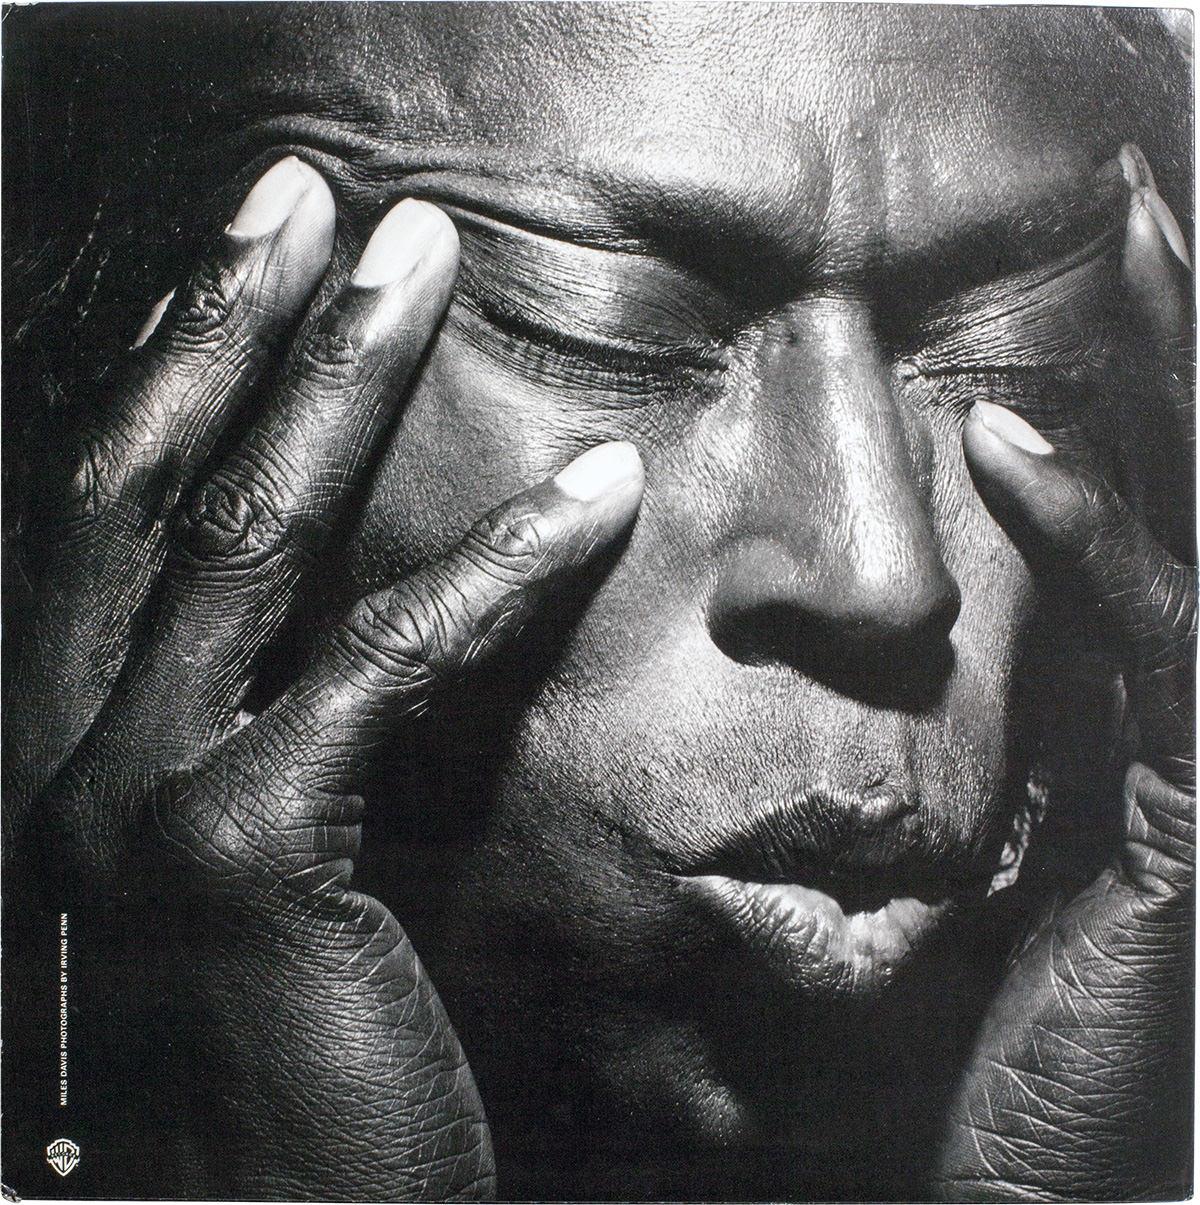 Miles Davis, Tutu, Warner Bros. Records, 1986. Fotó © Irving Penn